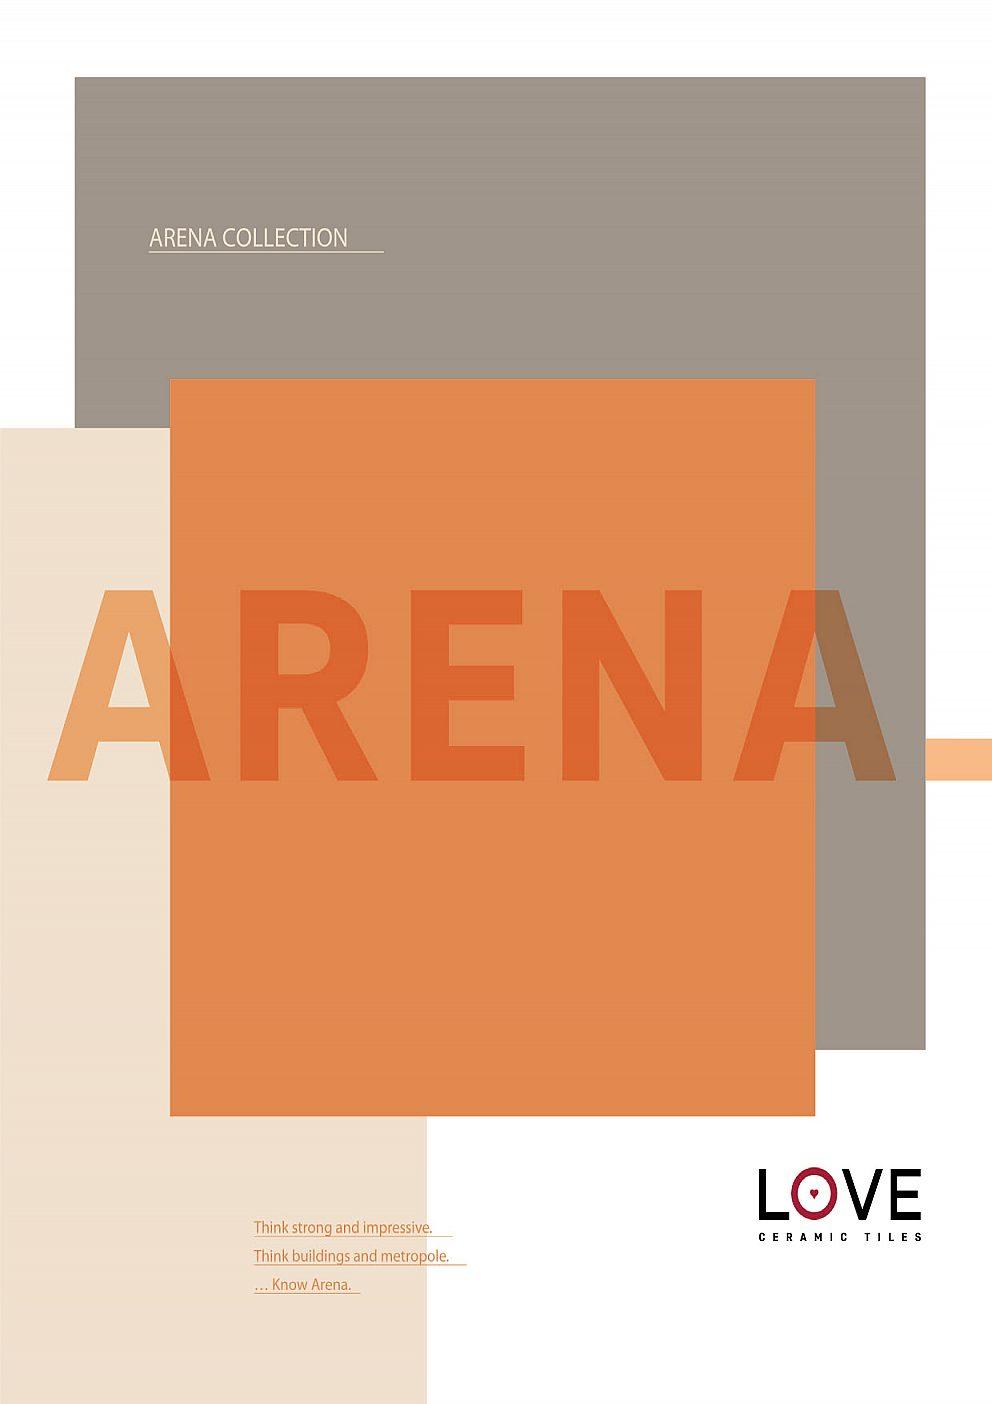 Love - Arena